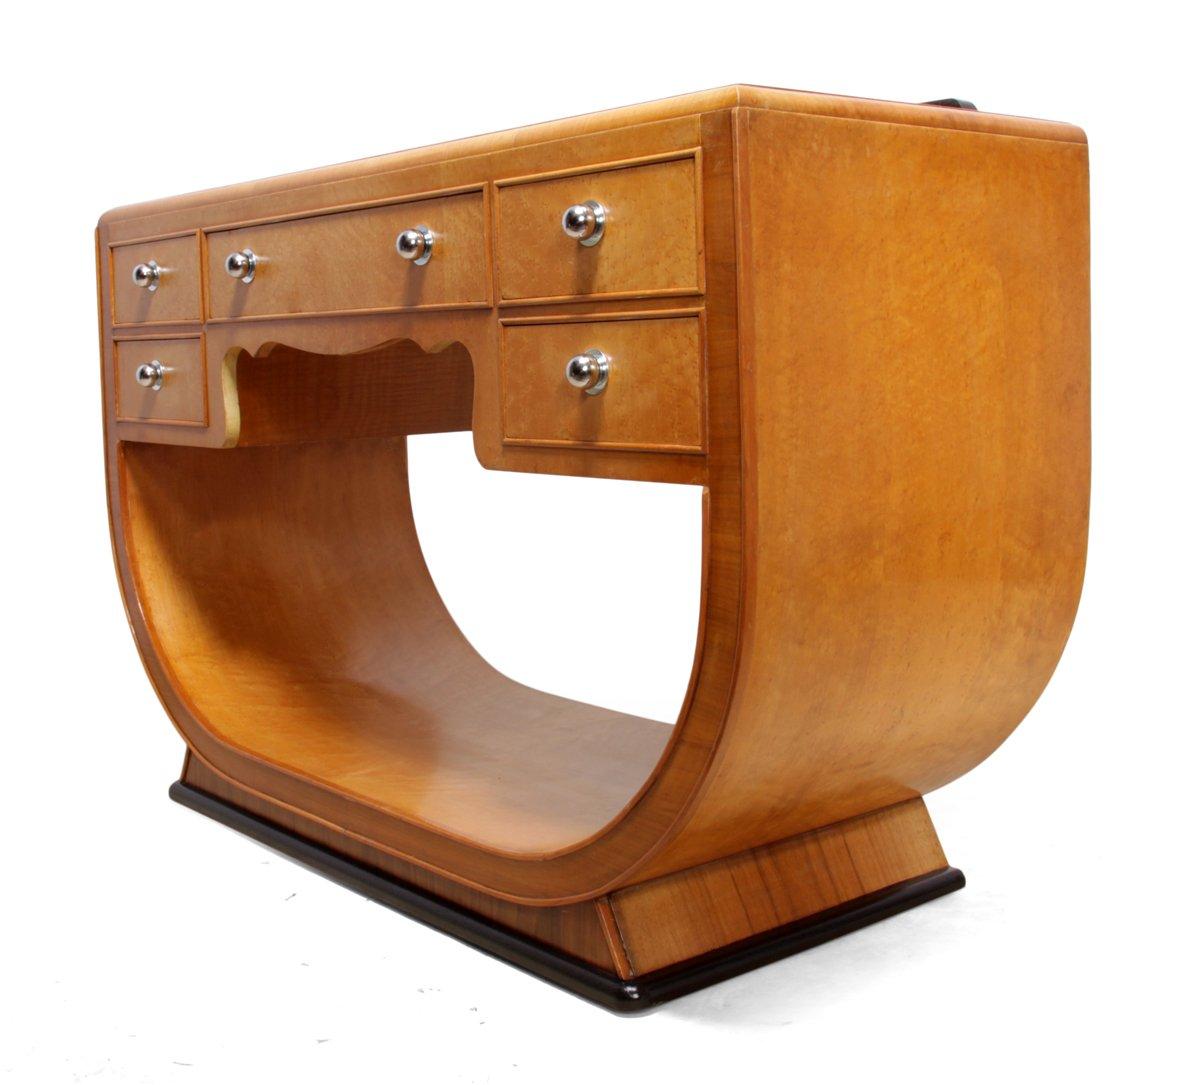 Art deco dressing table in birds eye maple s for sale